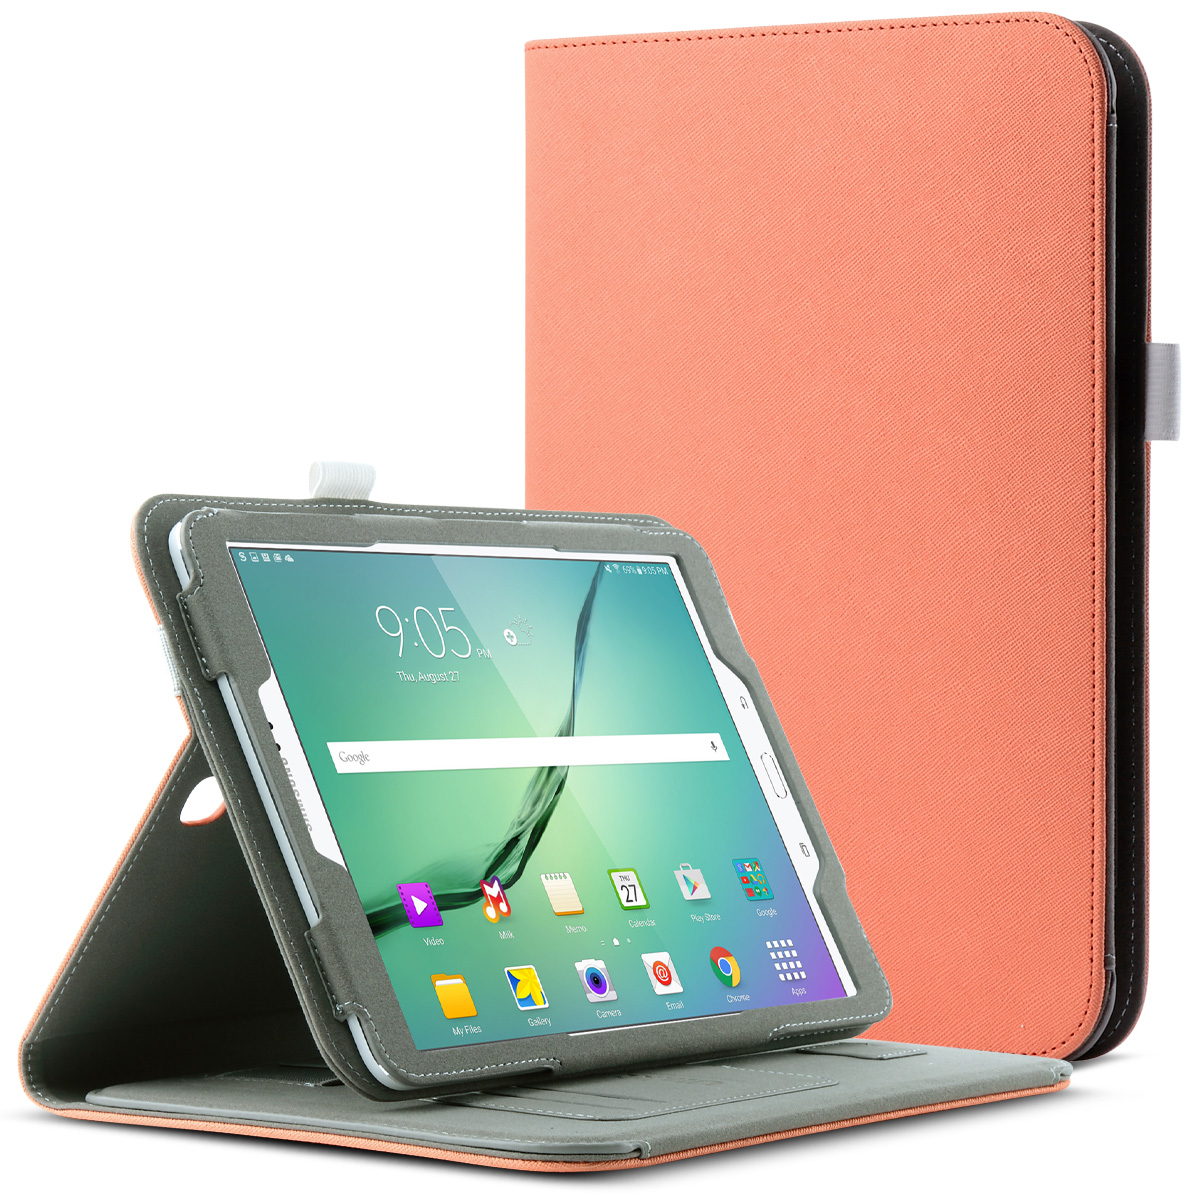 Galaxy Tab S2 Case, Tab S2 Keyboard, ULAK Portable Blueto...